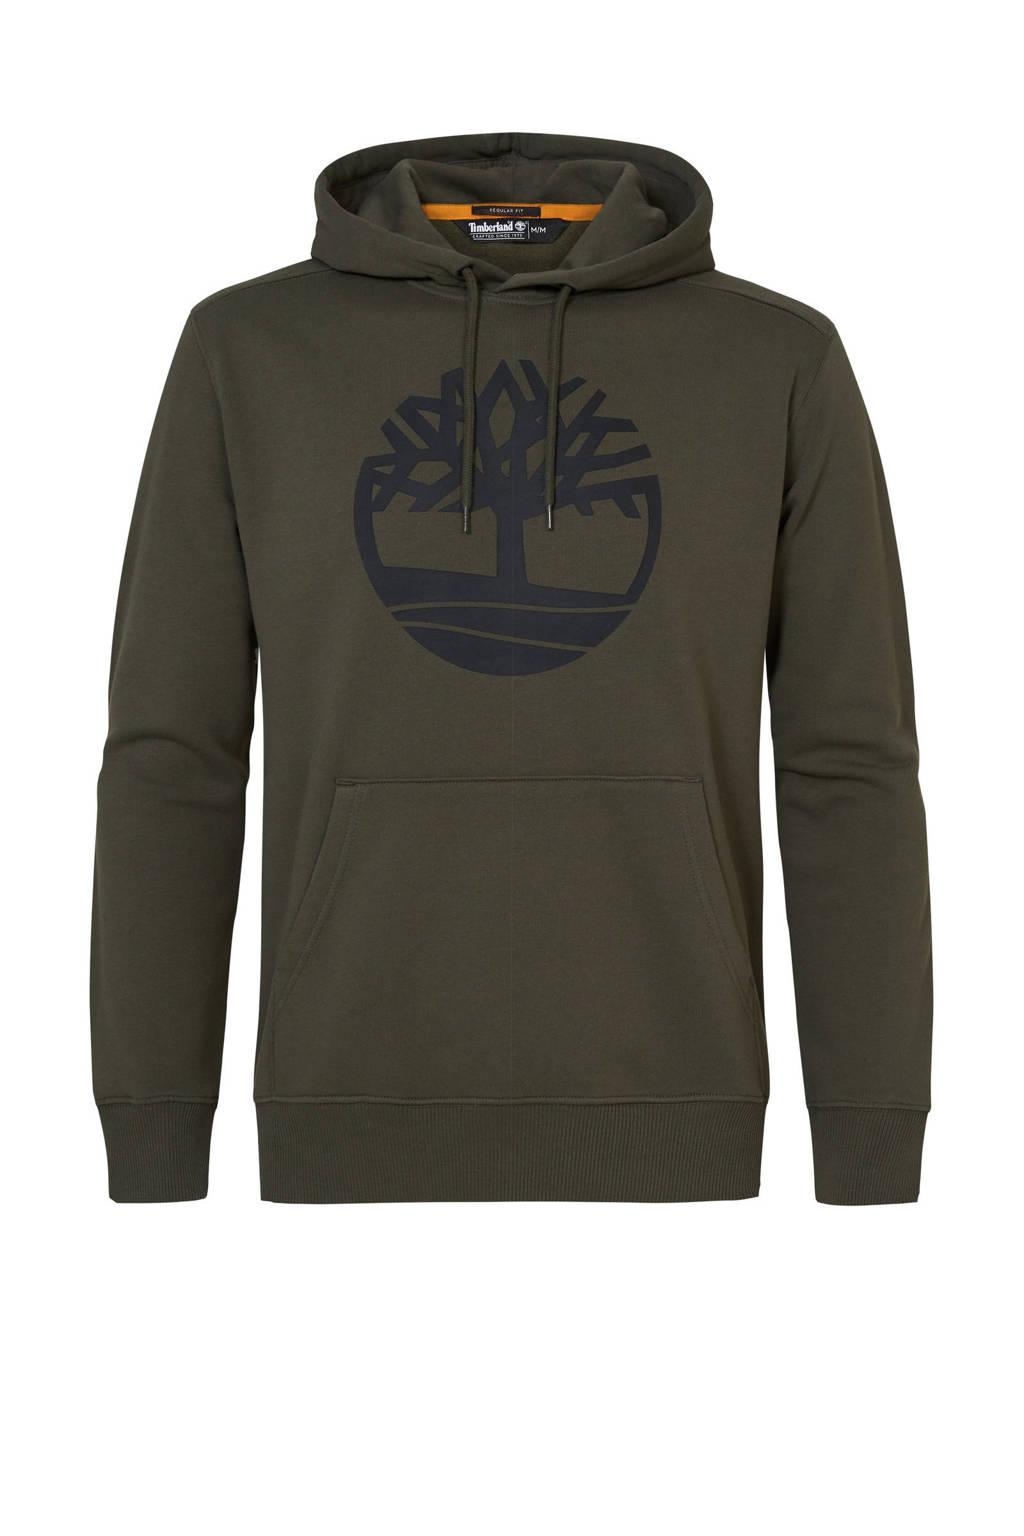 Timberland hoodie kaki, Kaki